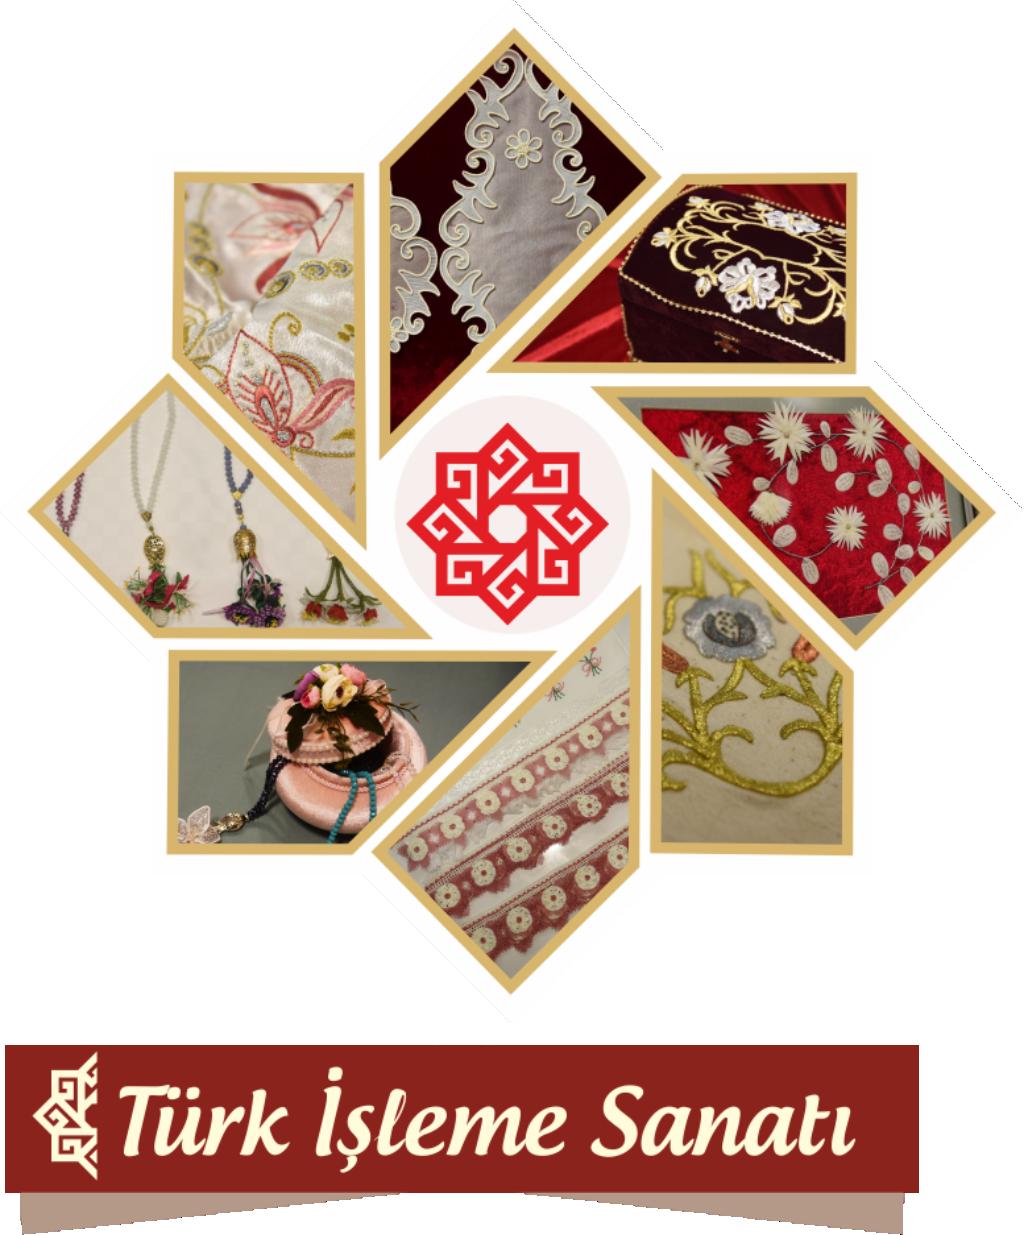 turk-isleme-sanati-logo